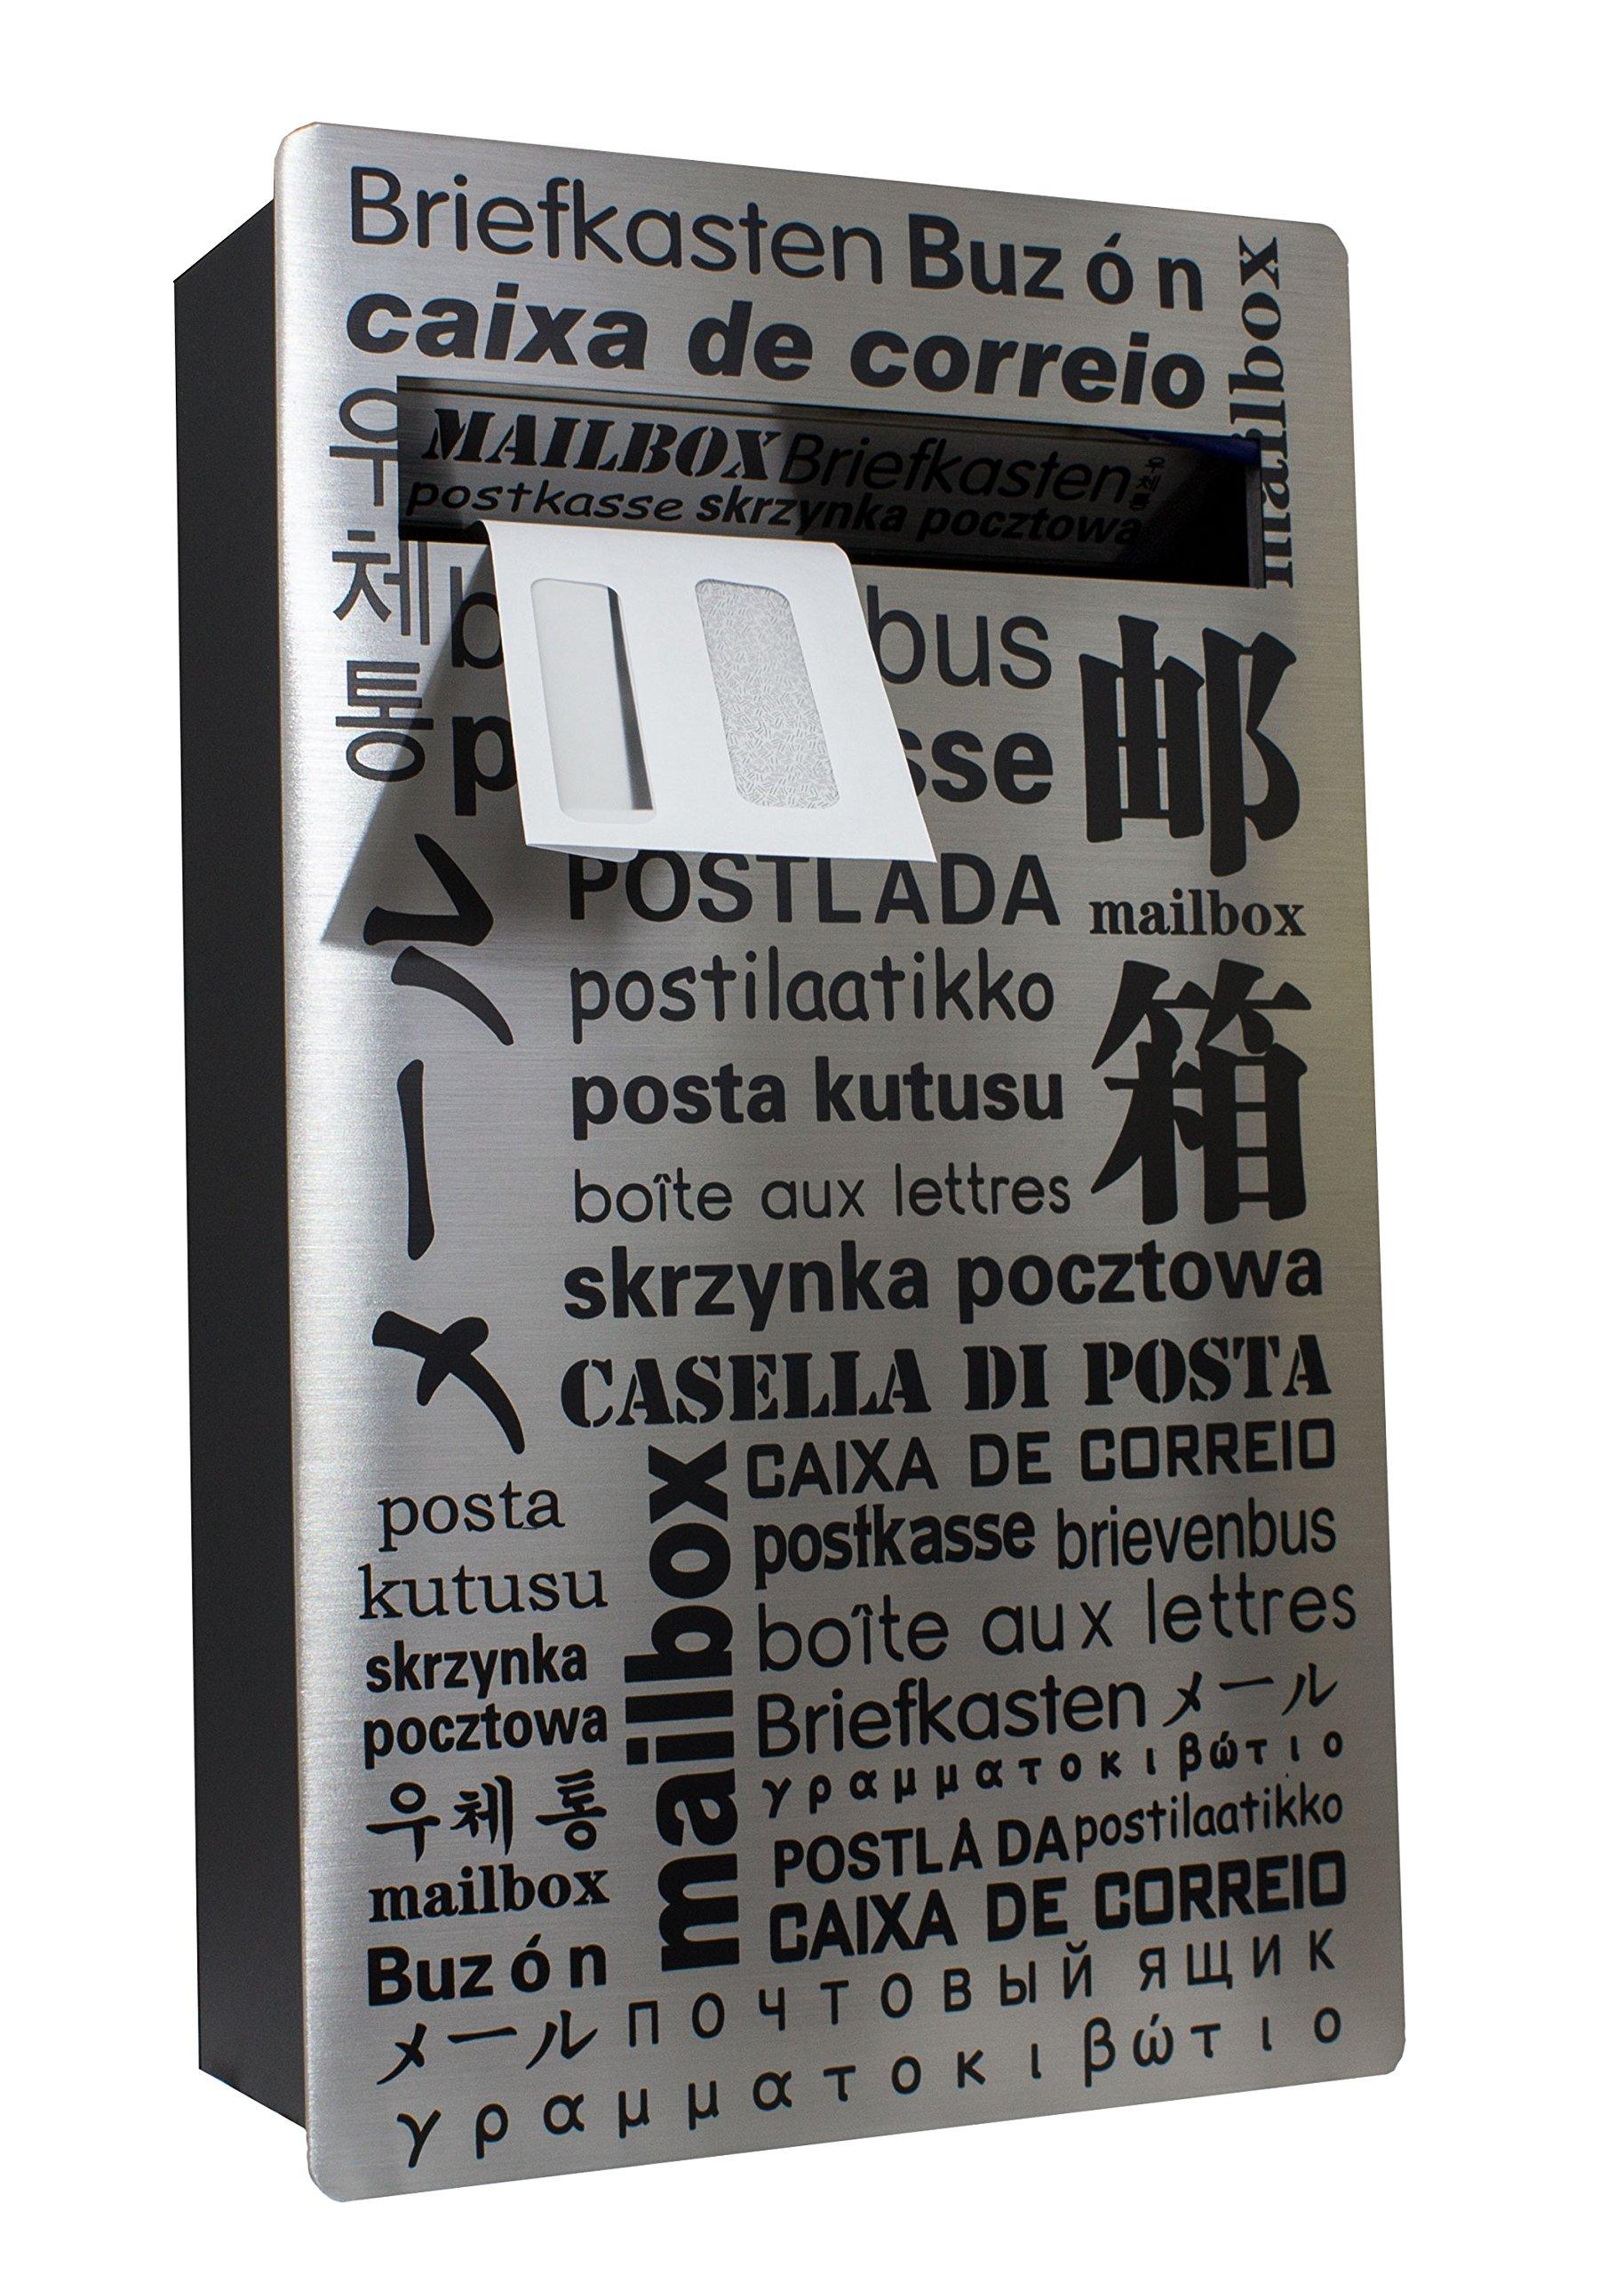 Qualarc WF-PM18 Verse Wall Mount Rectangular Stainless Steel Front Locking Mailbox, Silver/Black